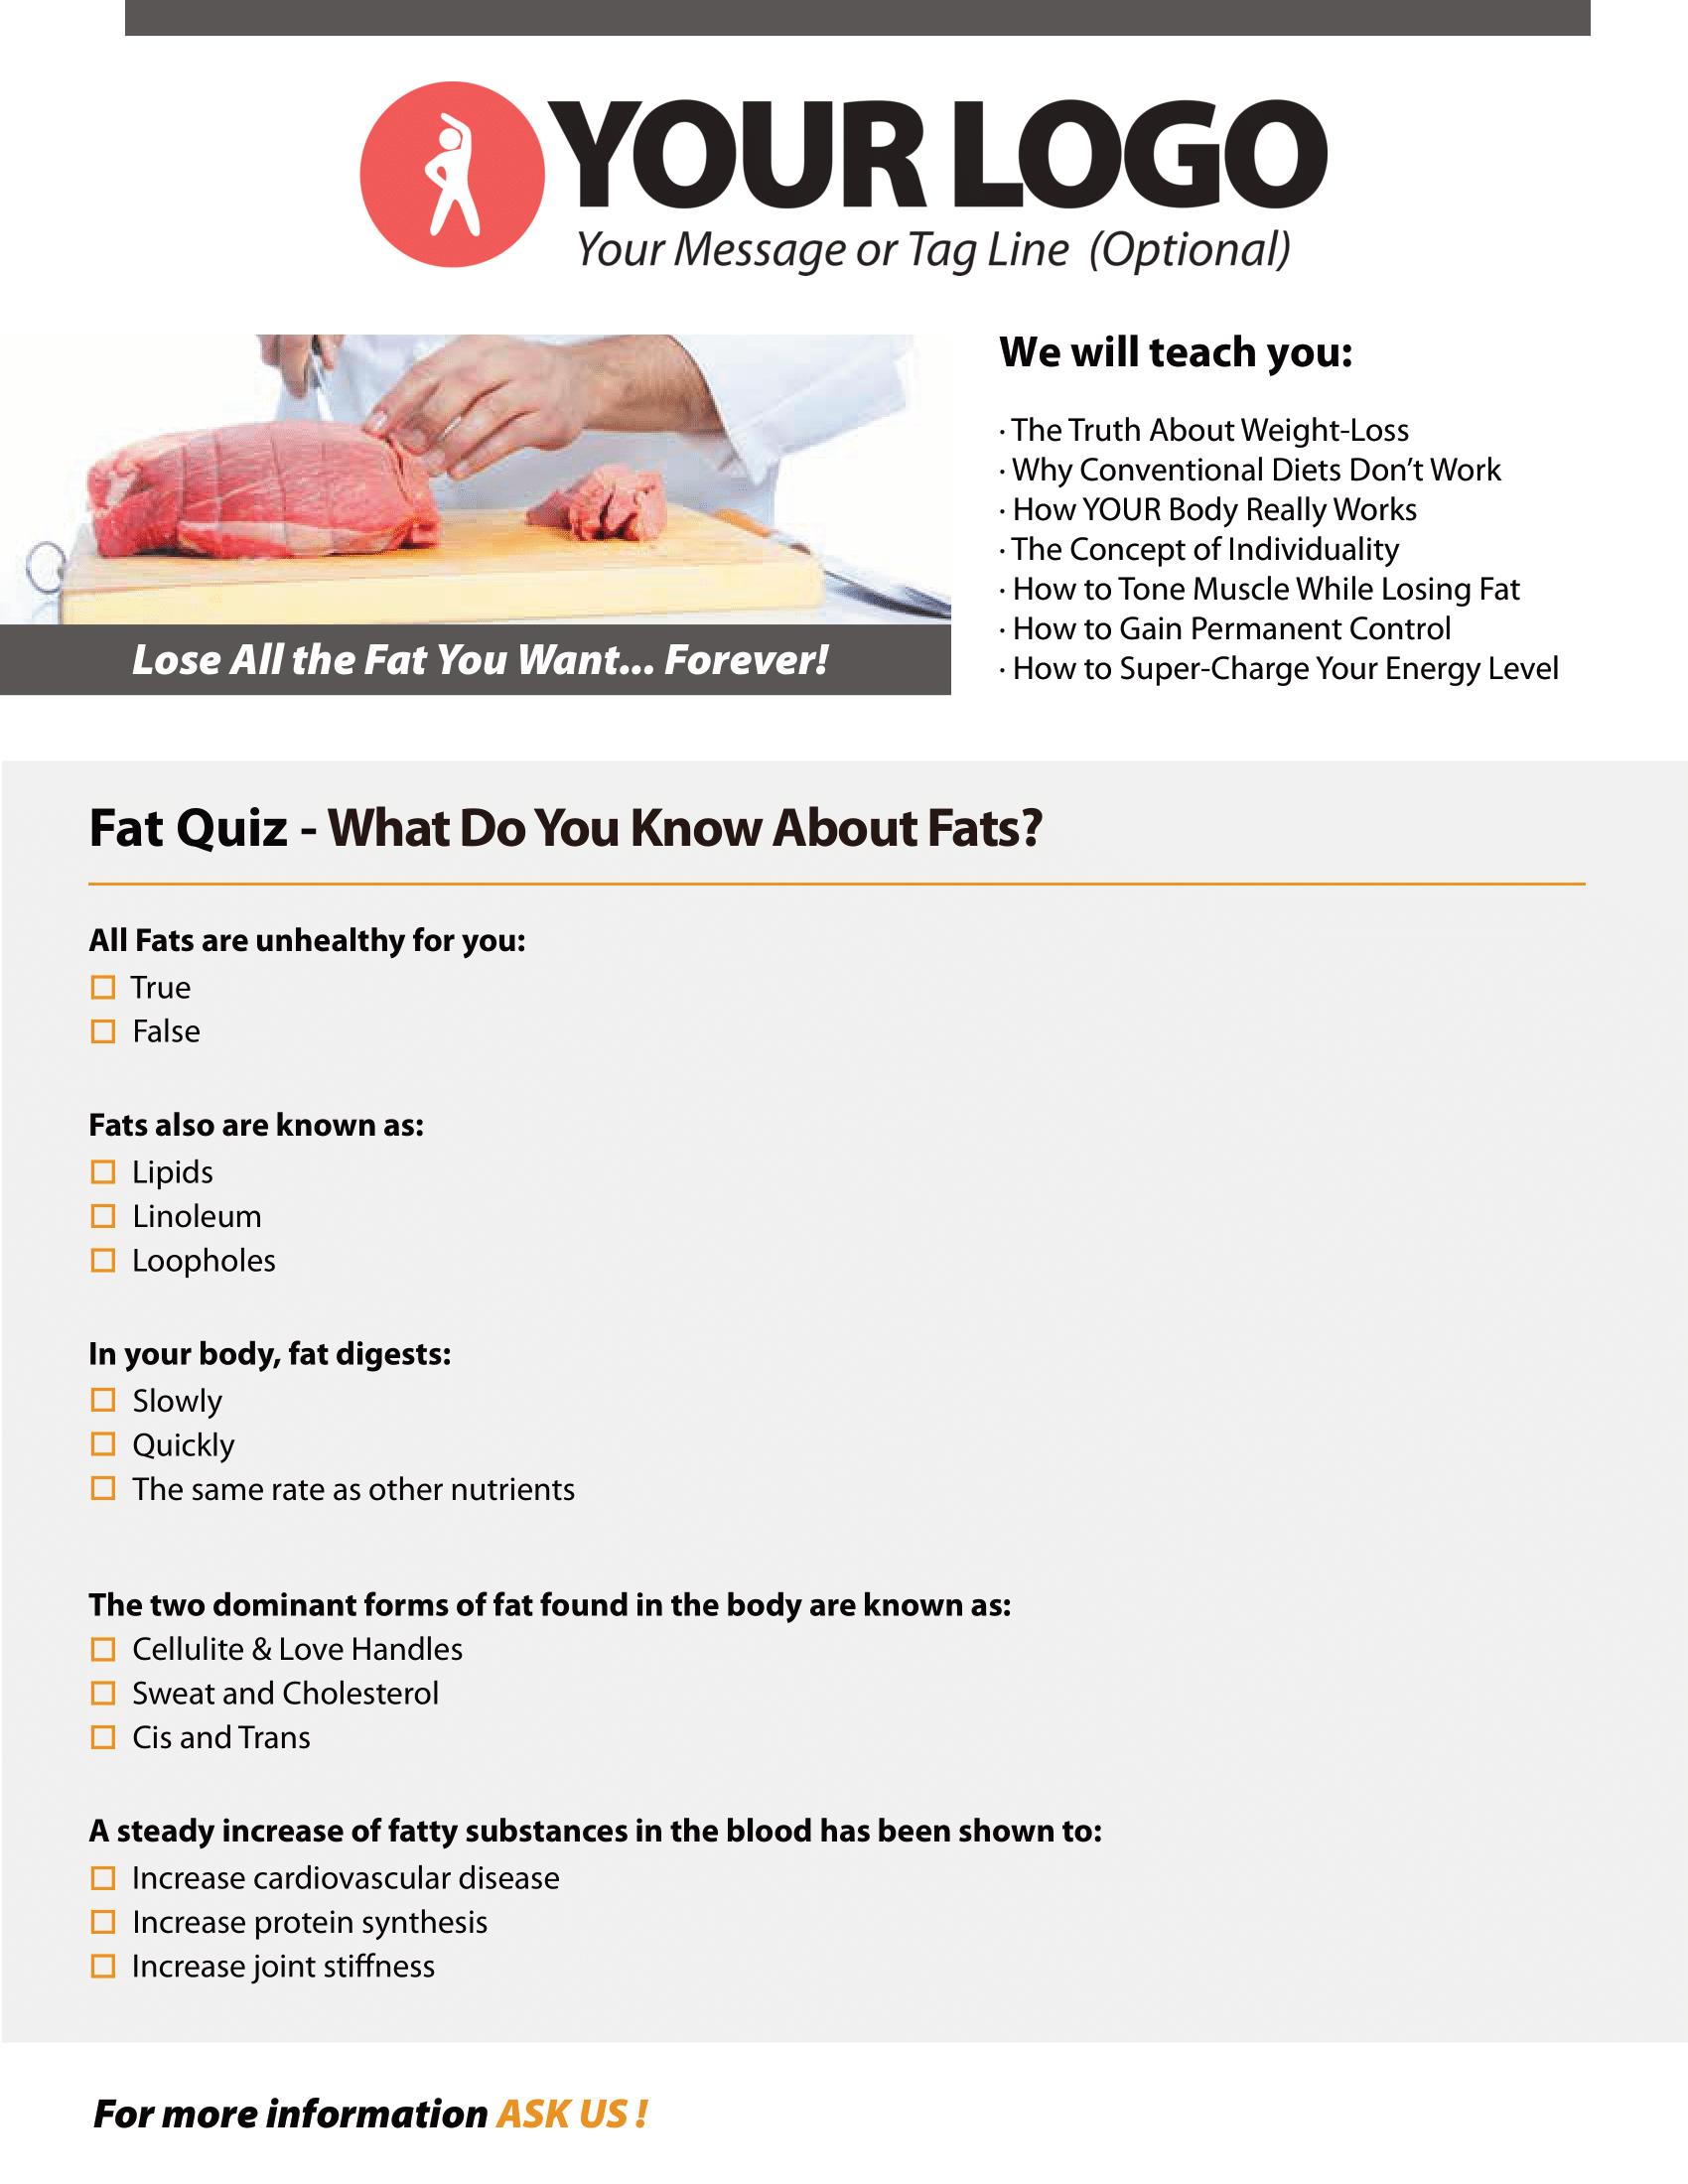 YOUR_LOGO_Quiz05_WE-1